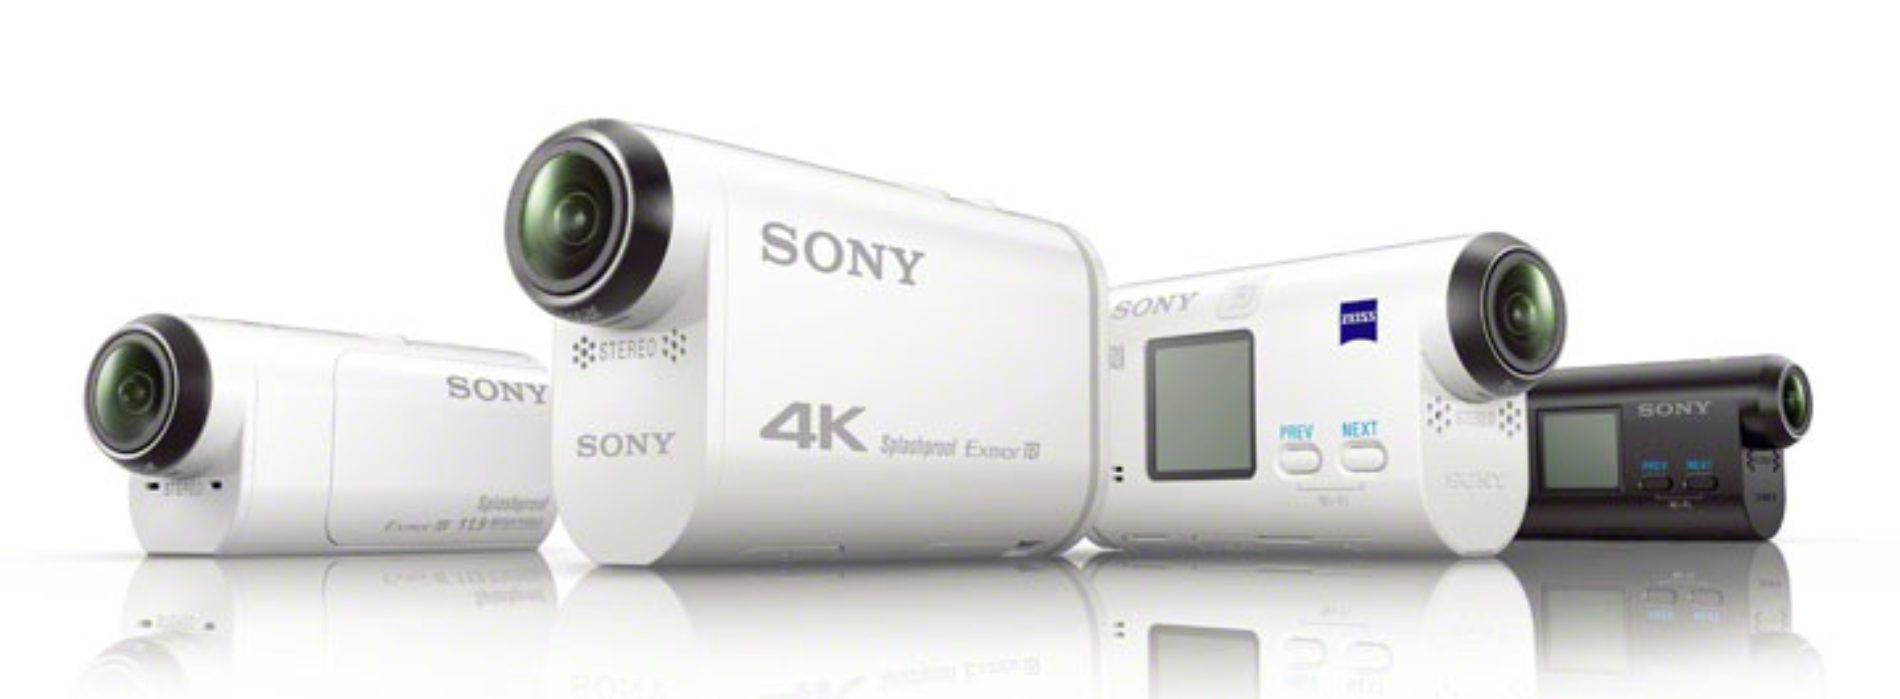 Ремонт экшн камер Sony